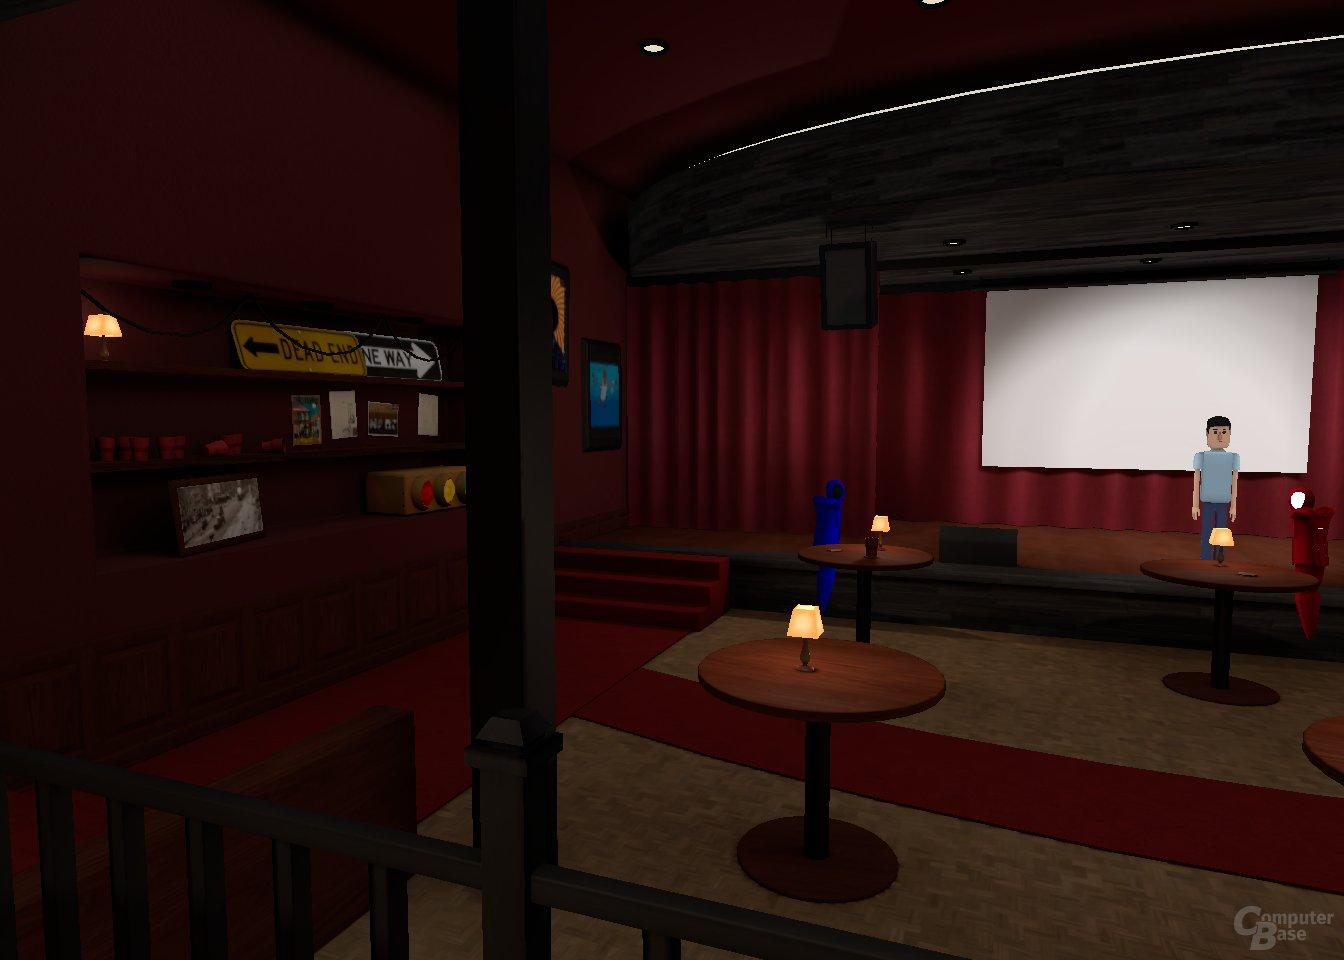 AltSpaceVR – Reggie Watts live in VR